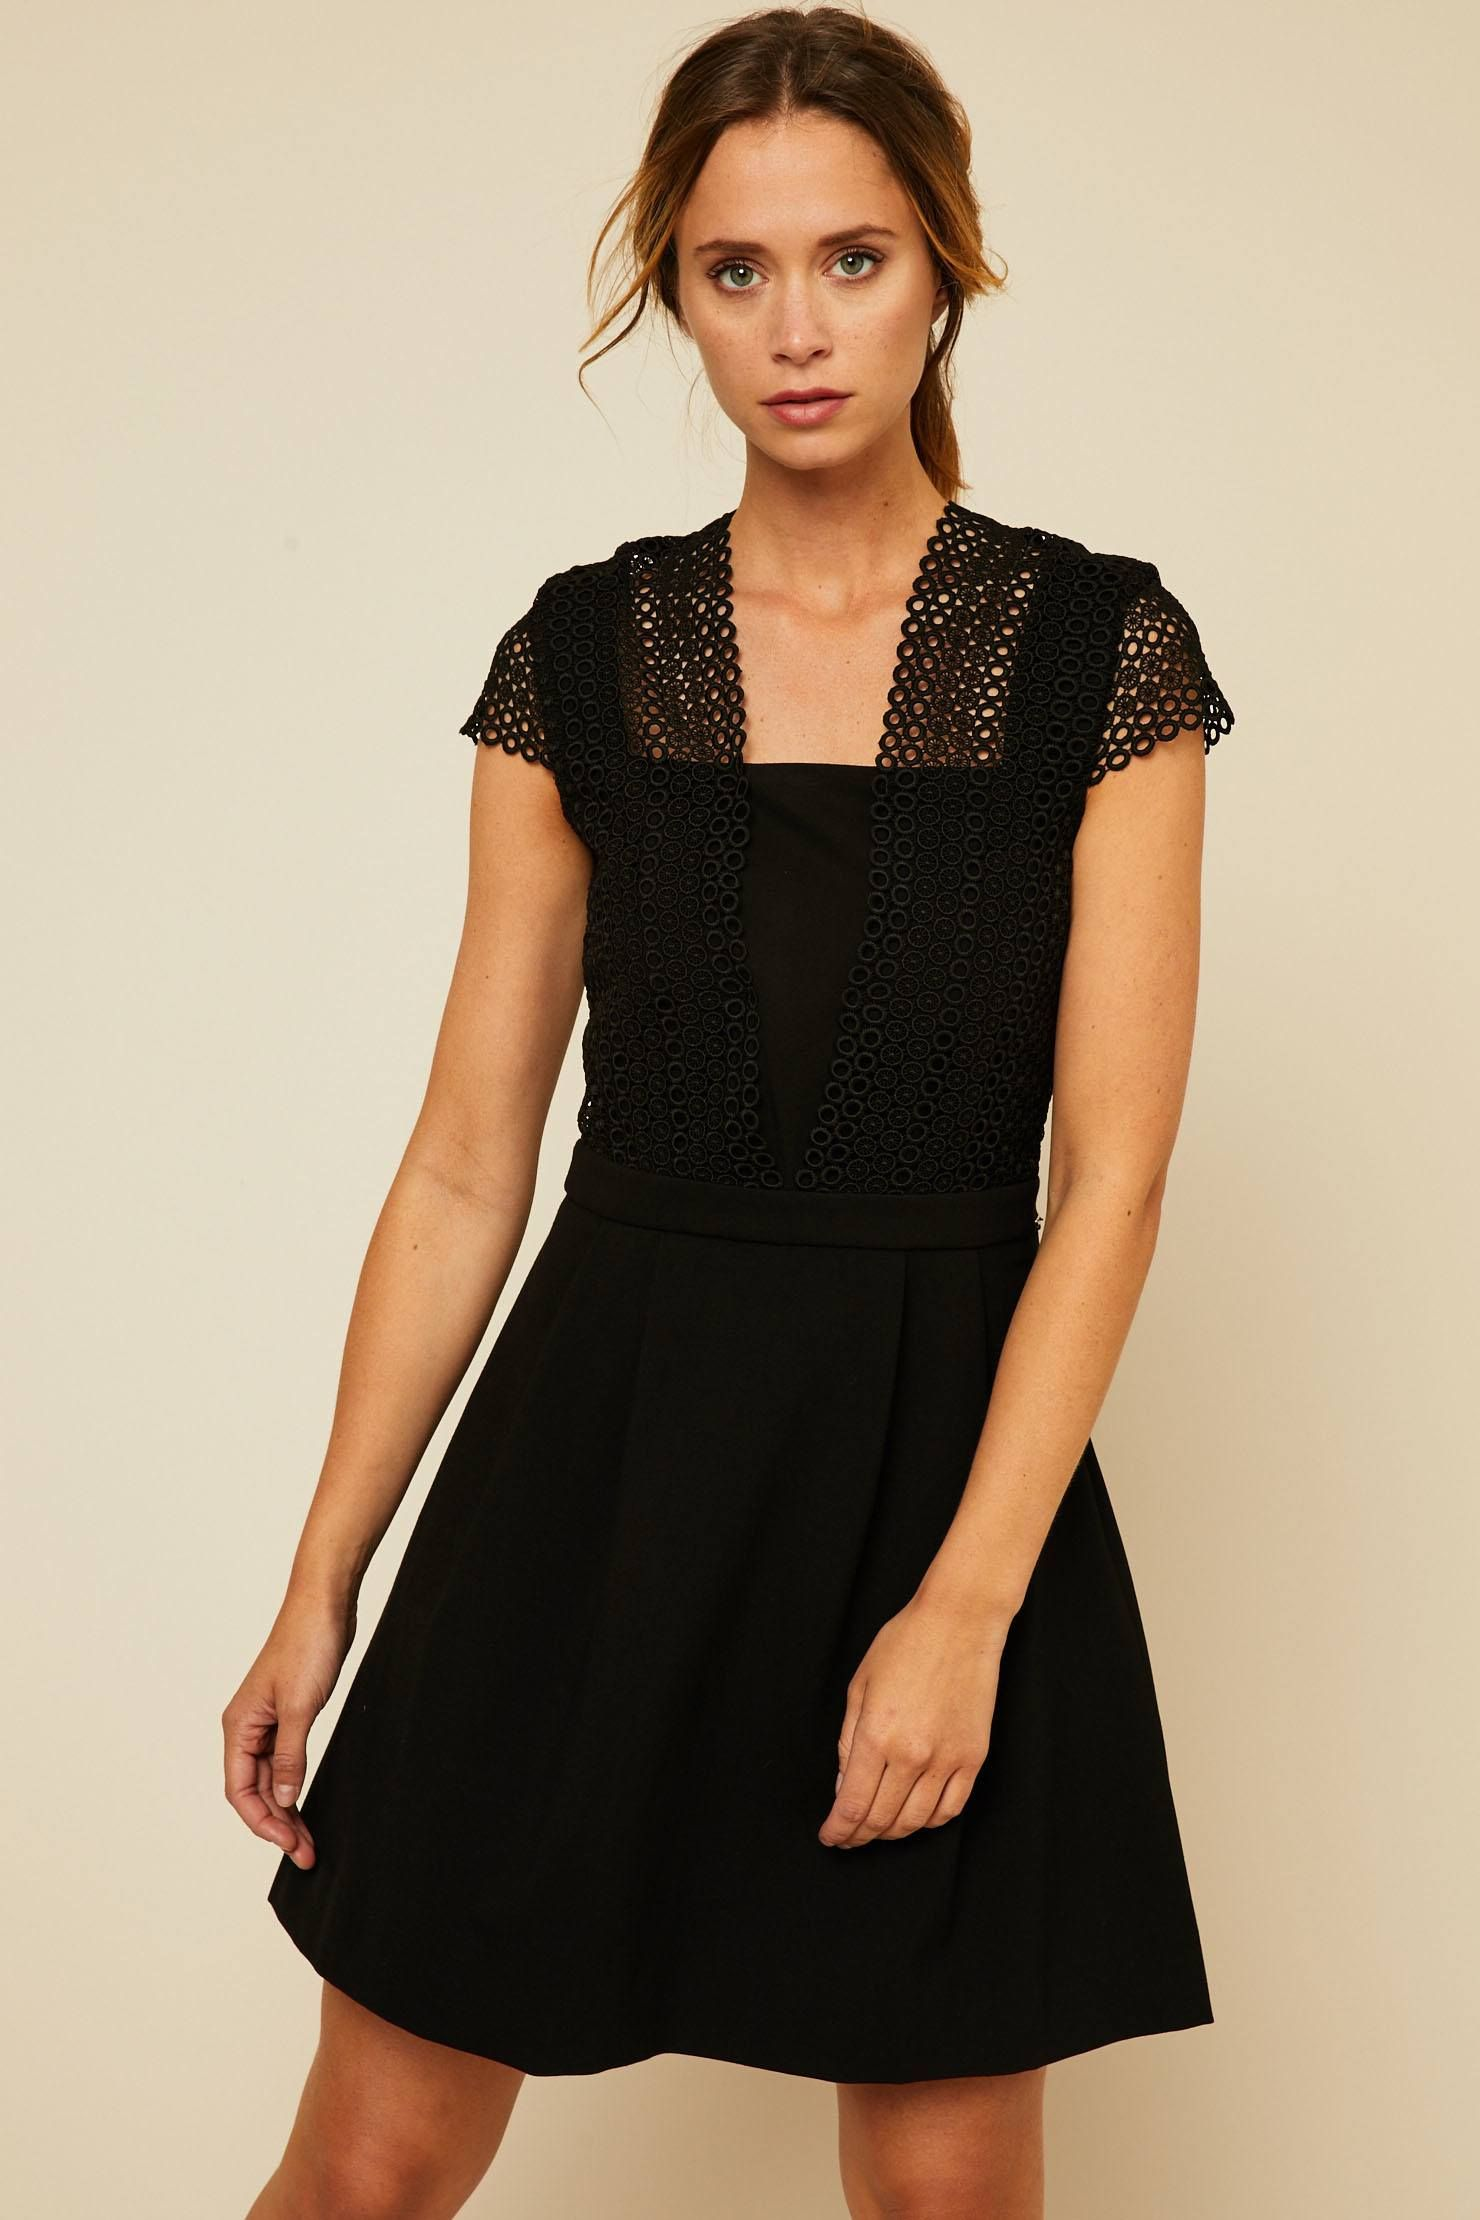 Ikks women Robe patineuse guipure noir   Mode Femme d8480e8c5b46